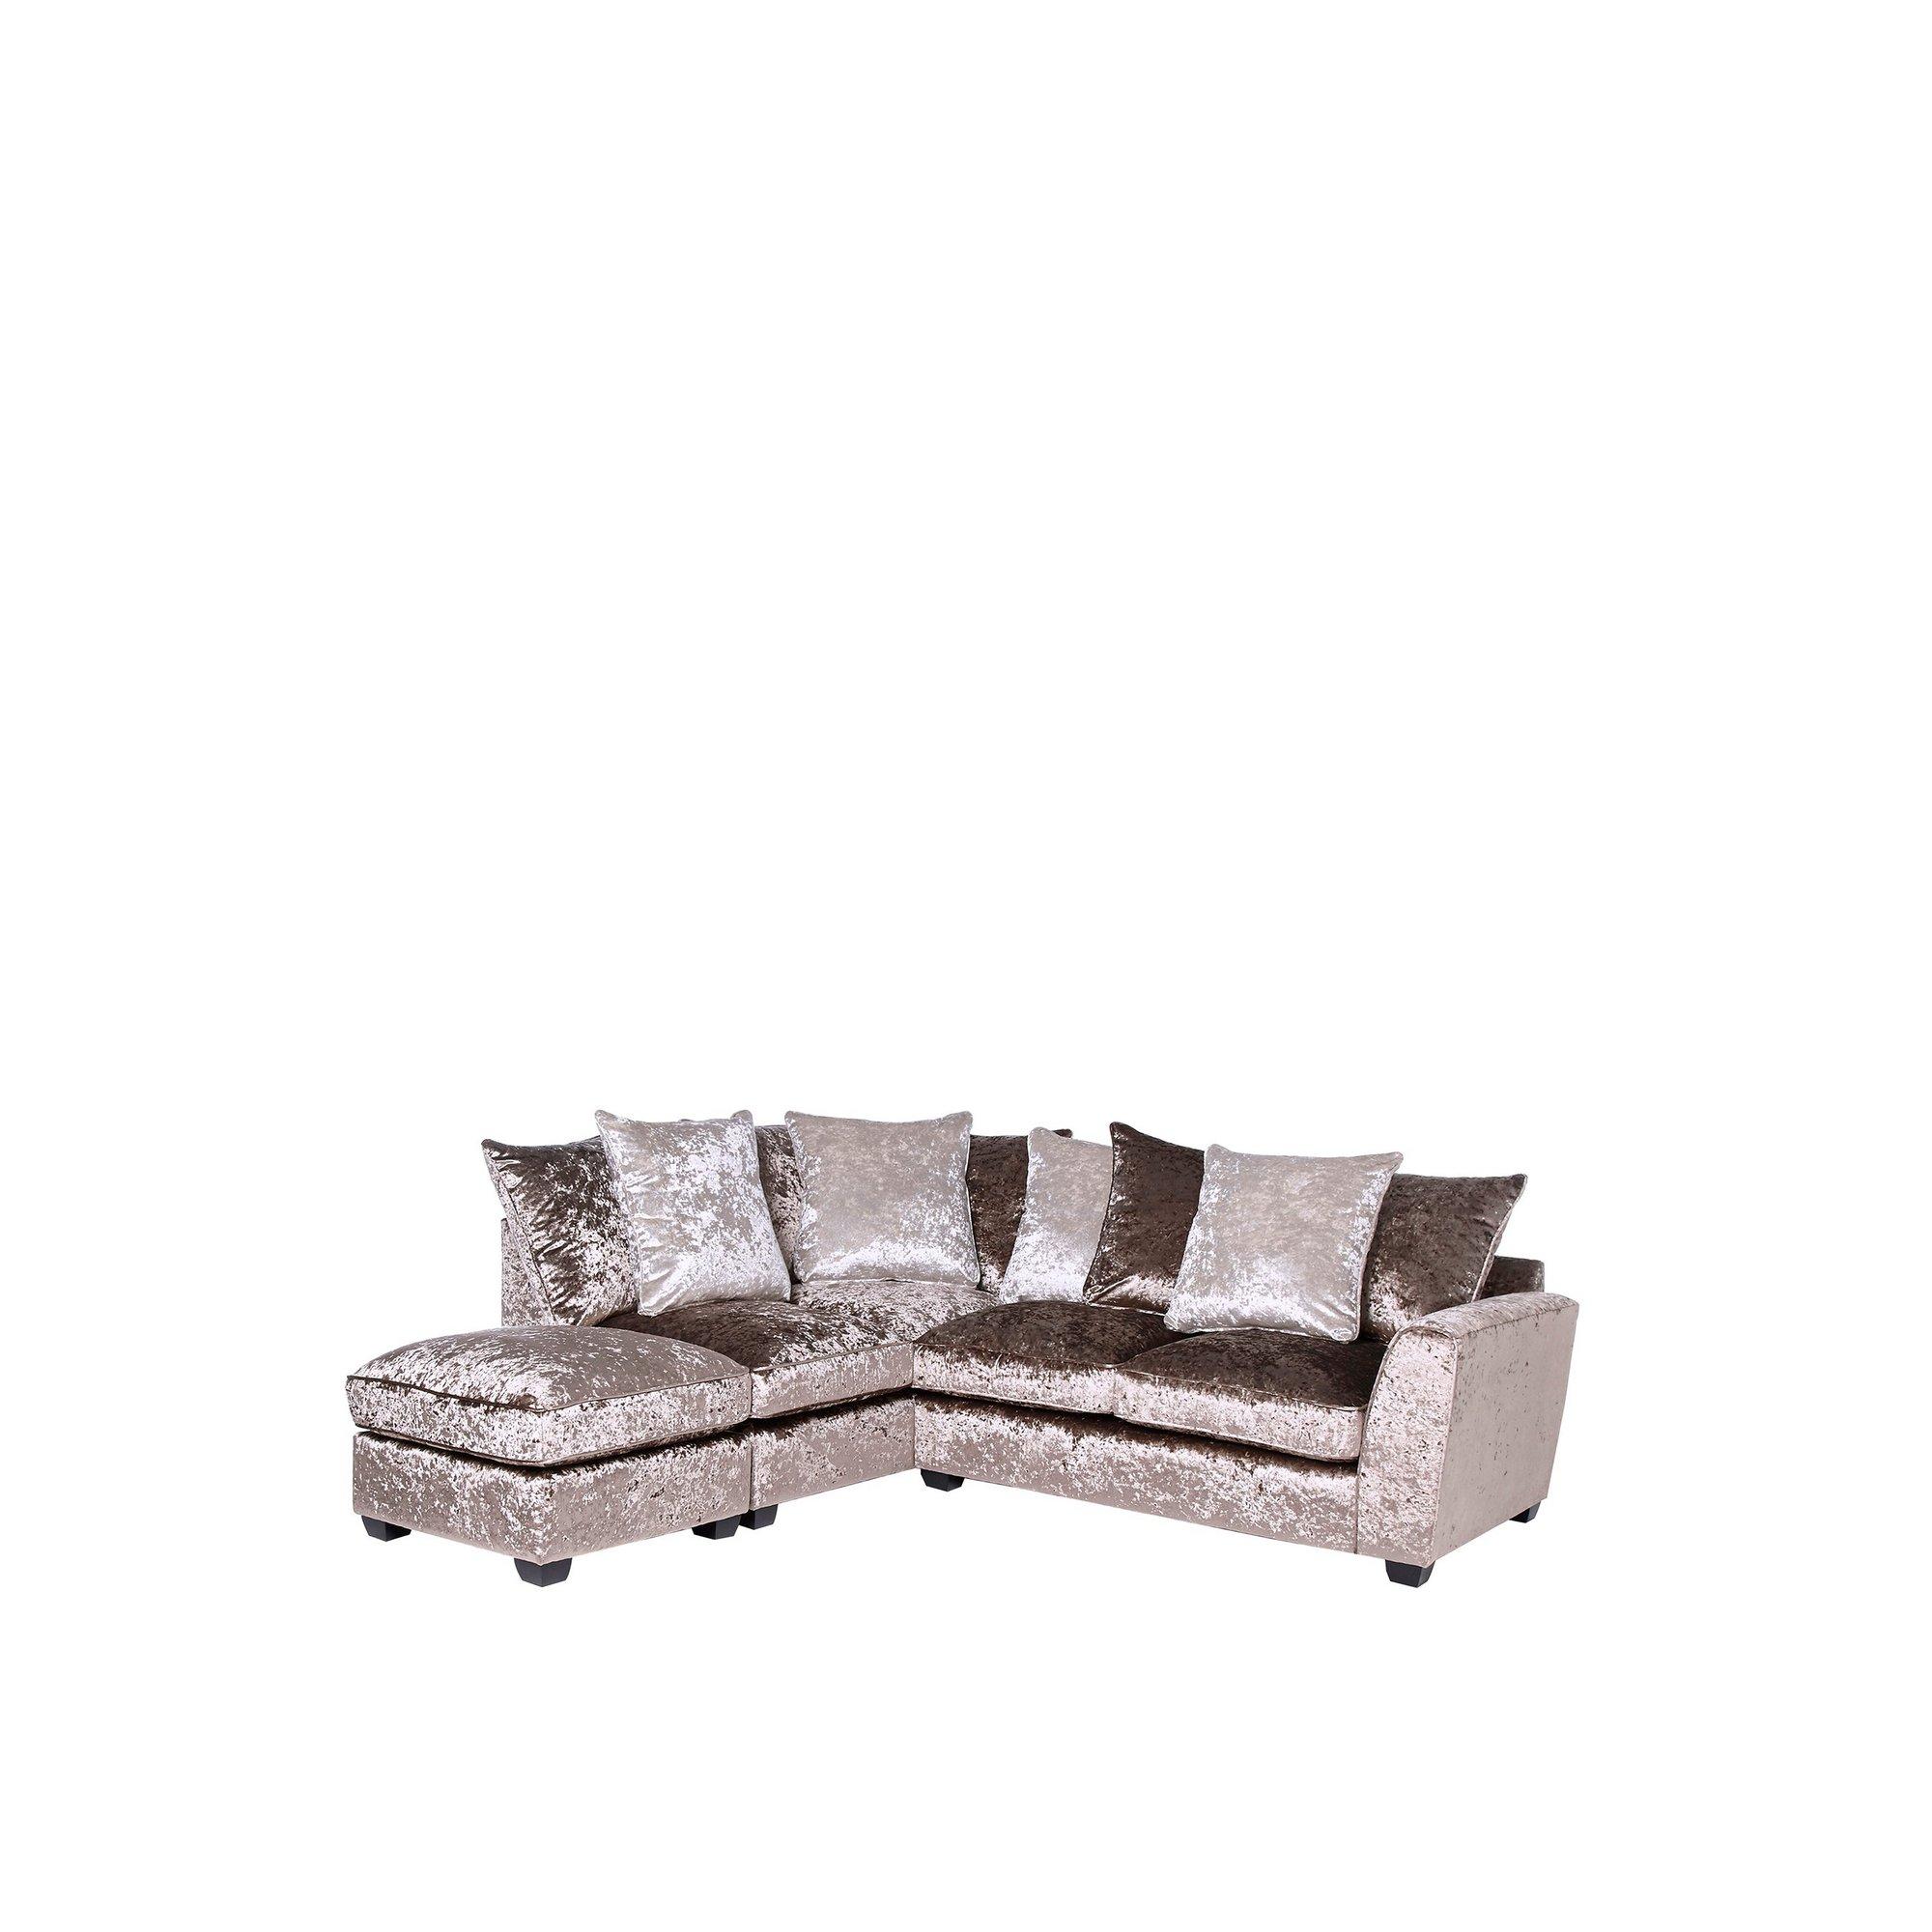 Image of Akira Left Corner Group Sofa